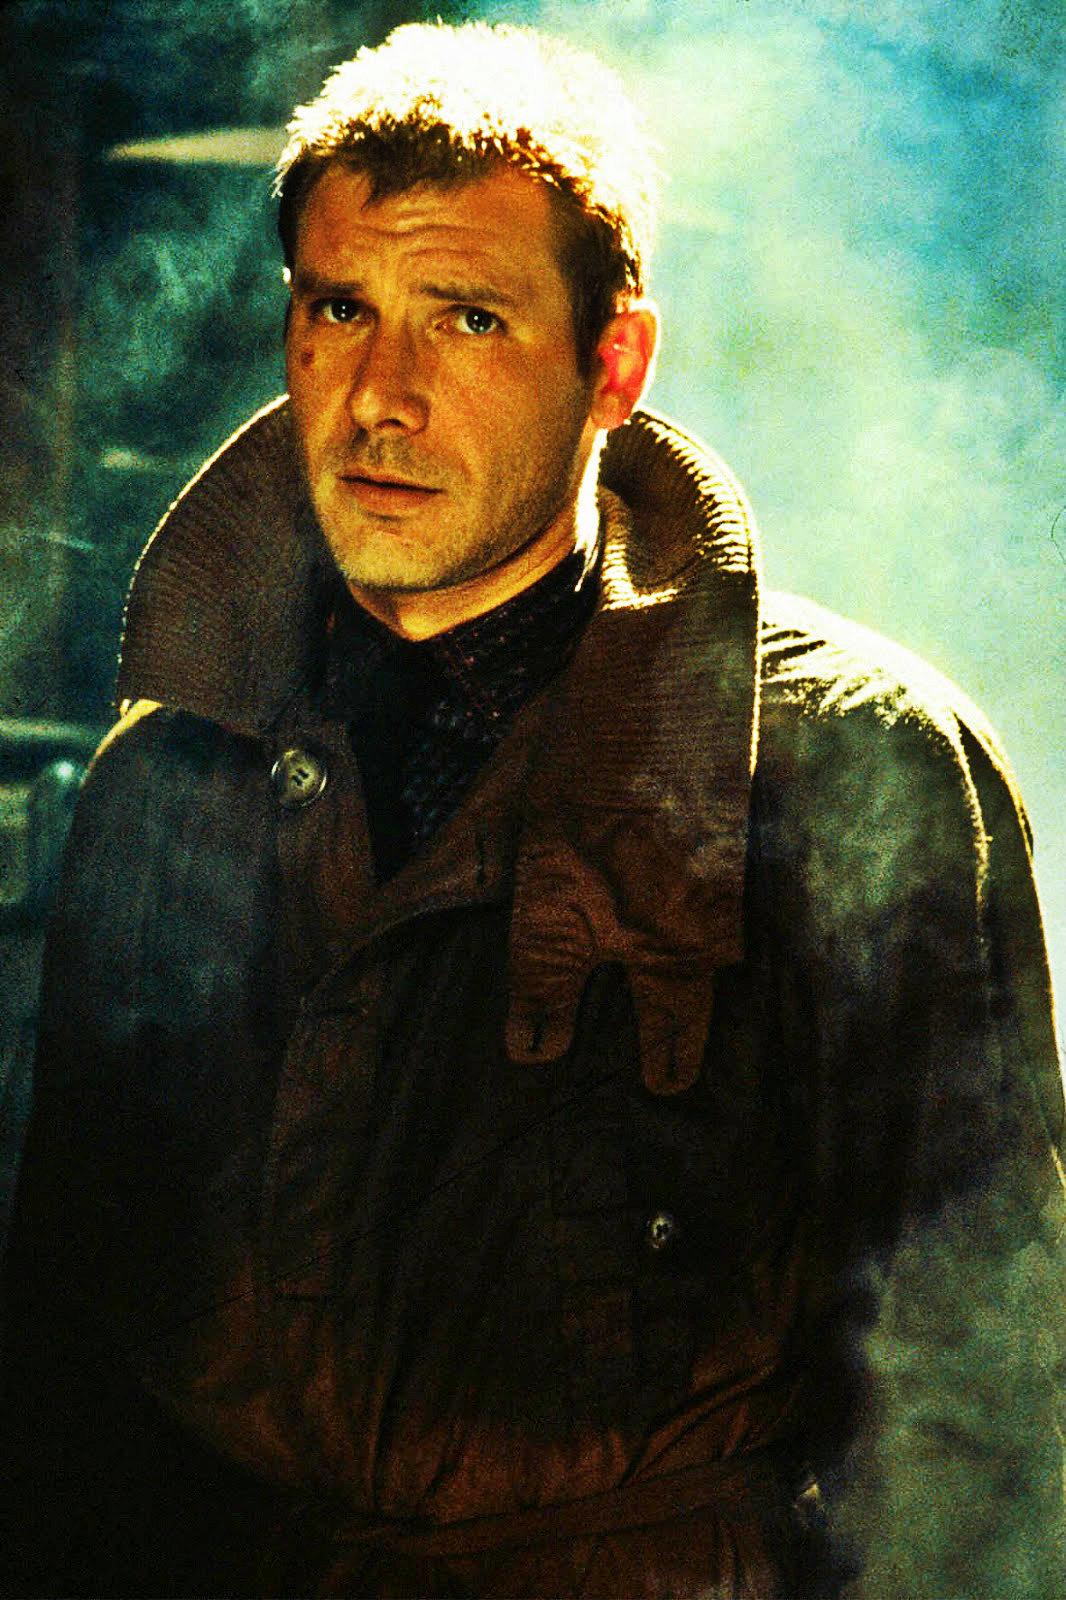 Blade Runner images Deckard HD wallpaper and background photos